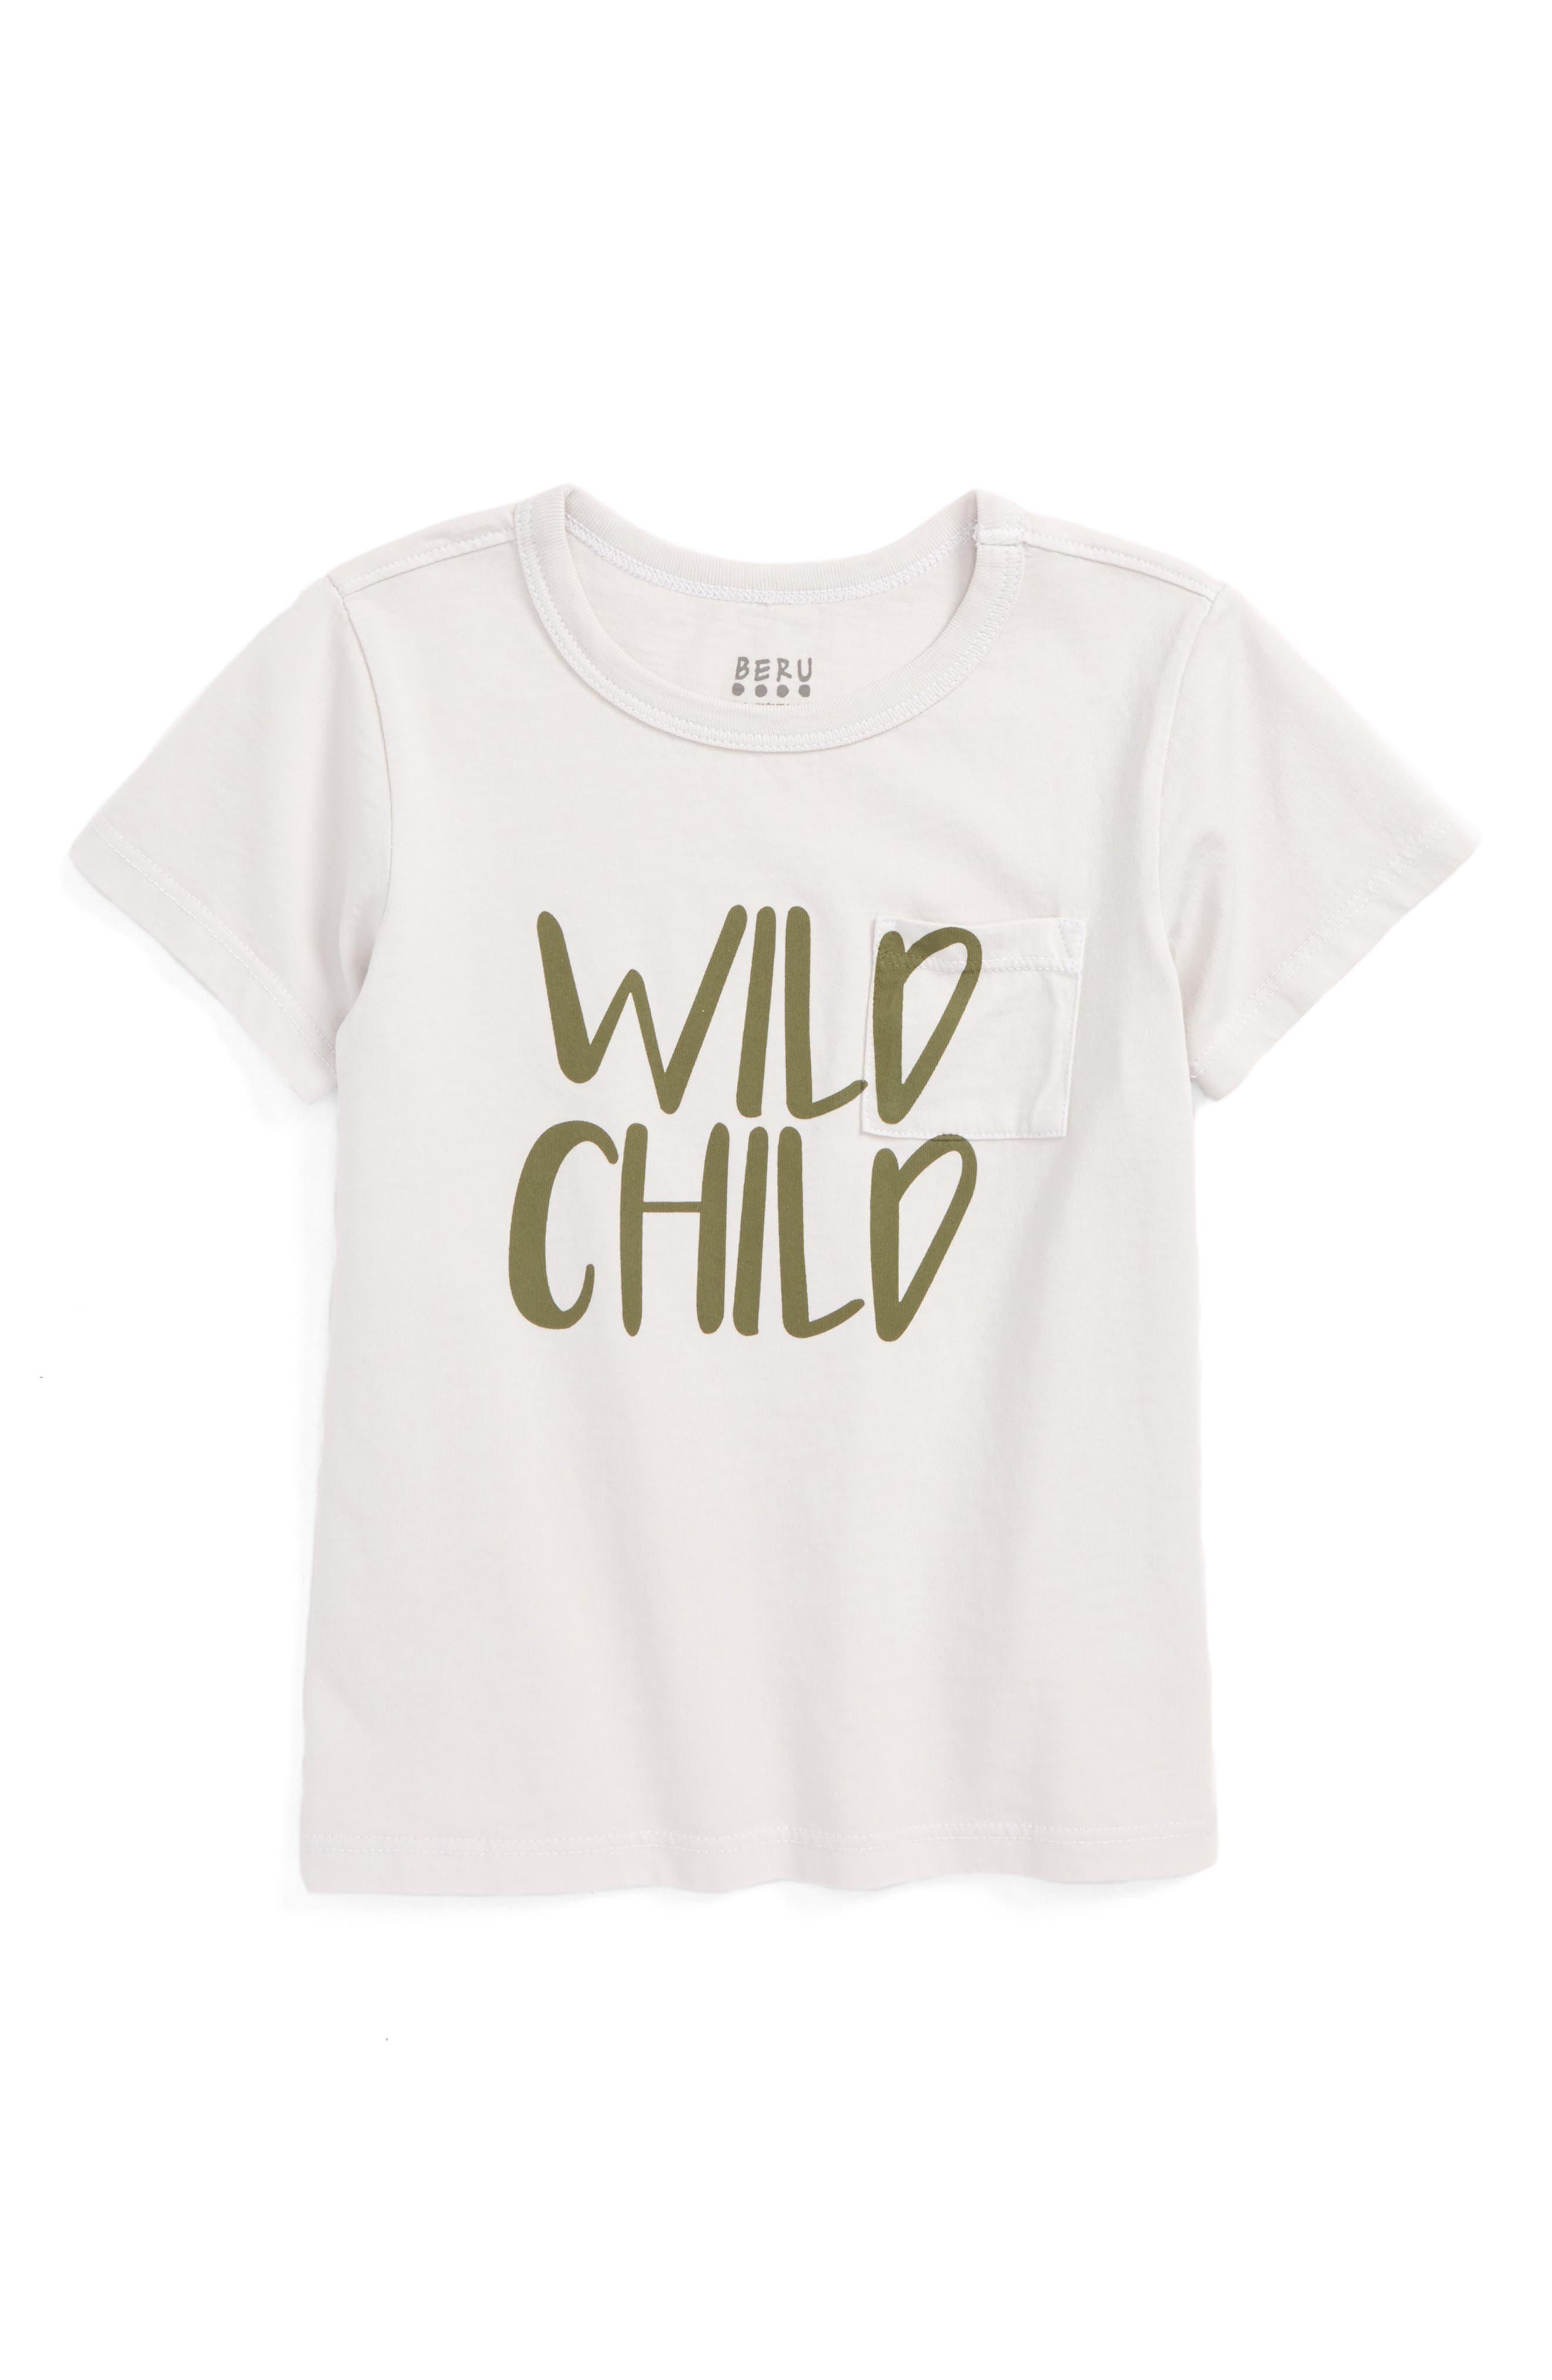 Main Image - BERU Huxley - Wild Child Organic Cotton T-Shirt (Toddler Boys & Little Boys)